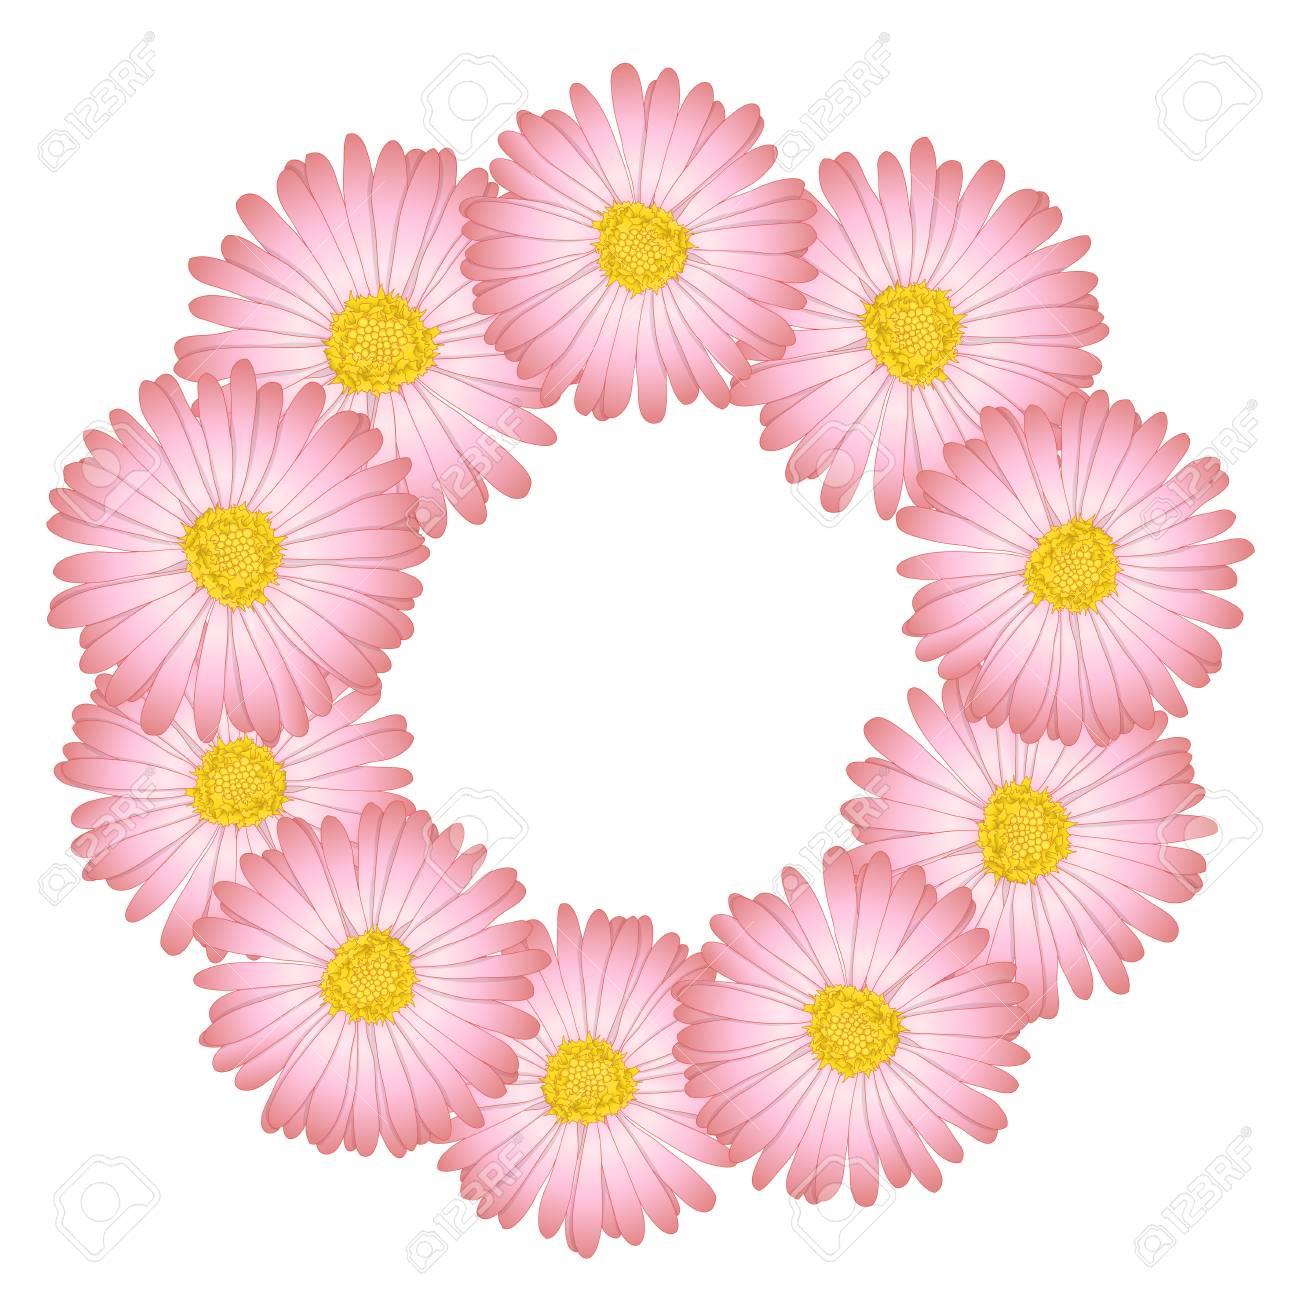 Pink aster daisy flower wreath vector illustration royalty free pink aster daisy flower wreath vector illustration stock vector 104820708 izmirmasajfo